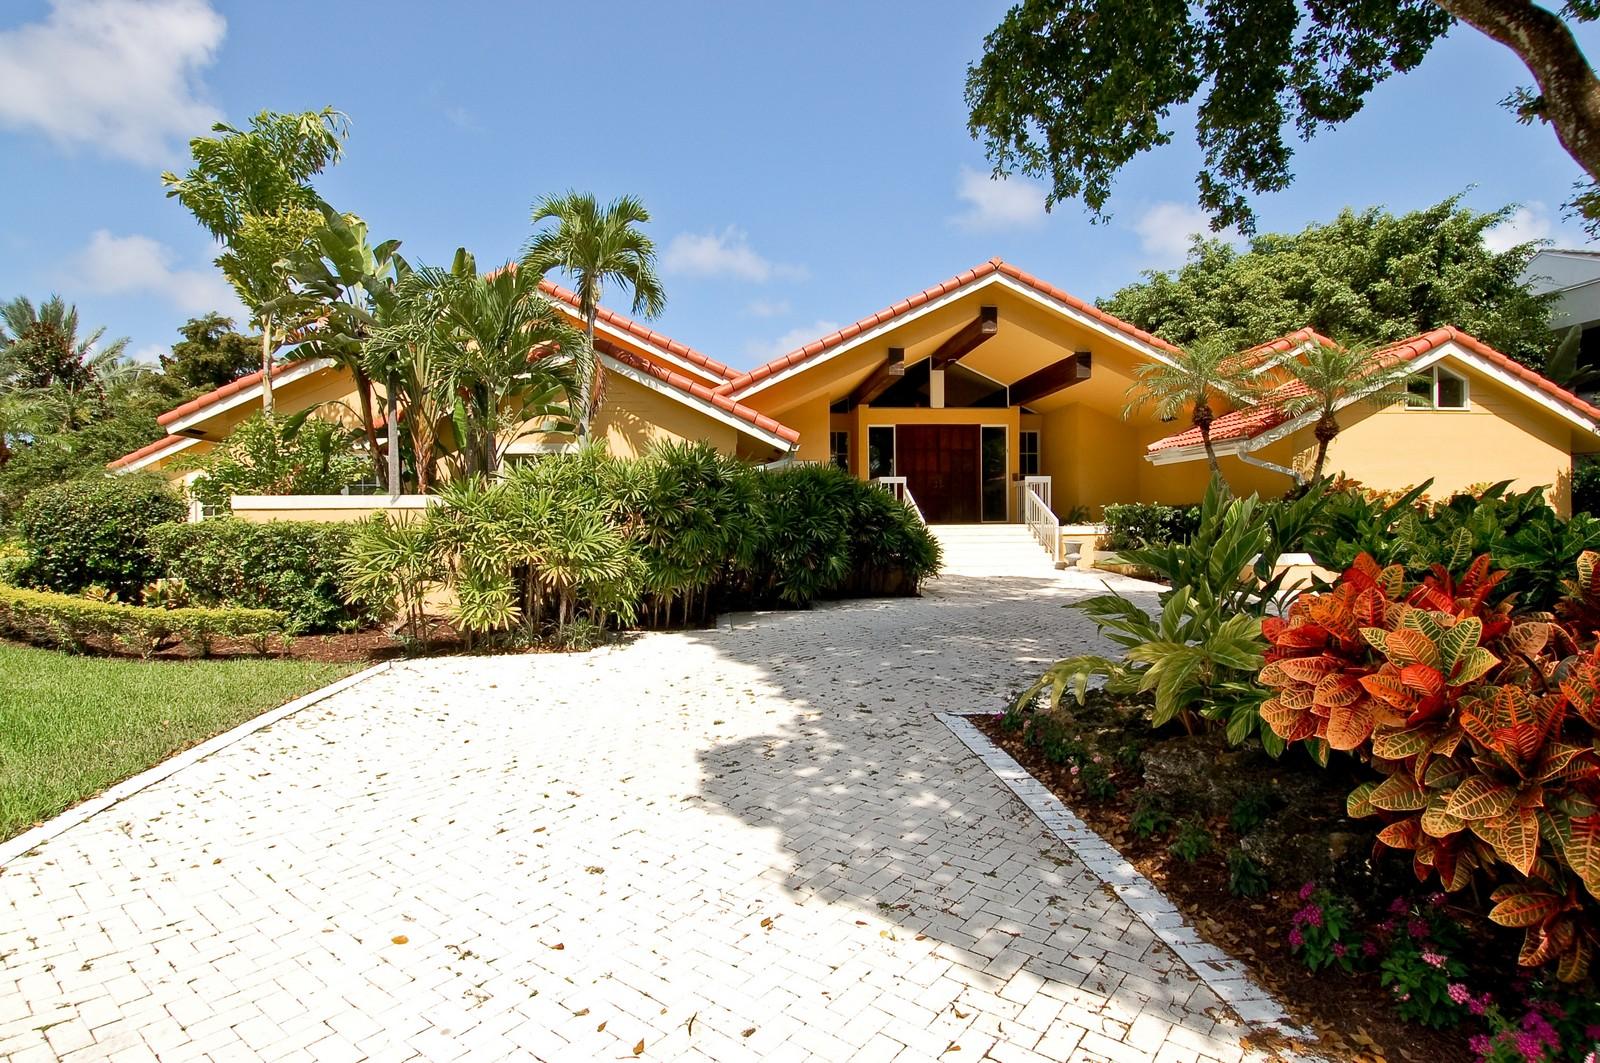 Real Estate Photography - 4798 Sanctuary Ln, Boca Raton, FL, 33431 - Front View